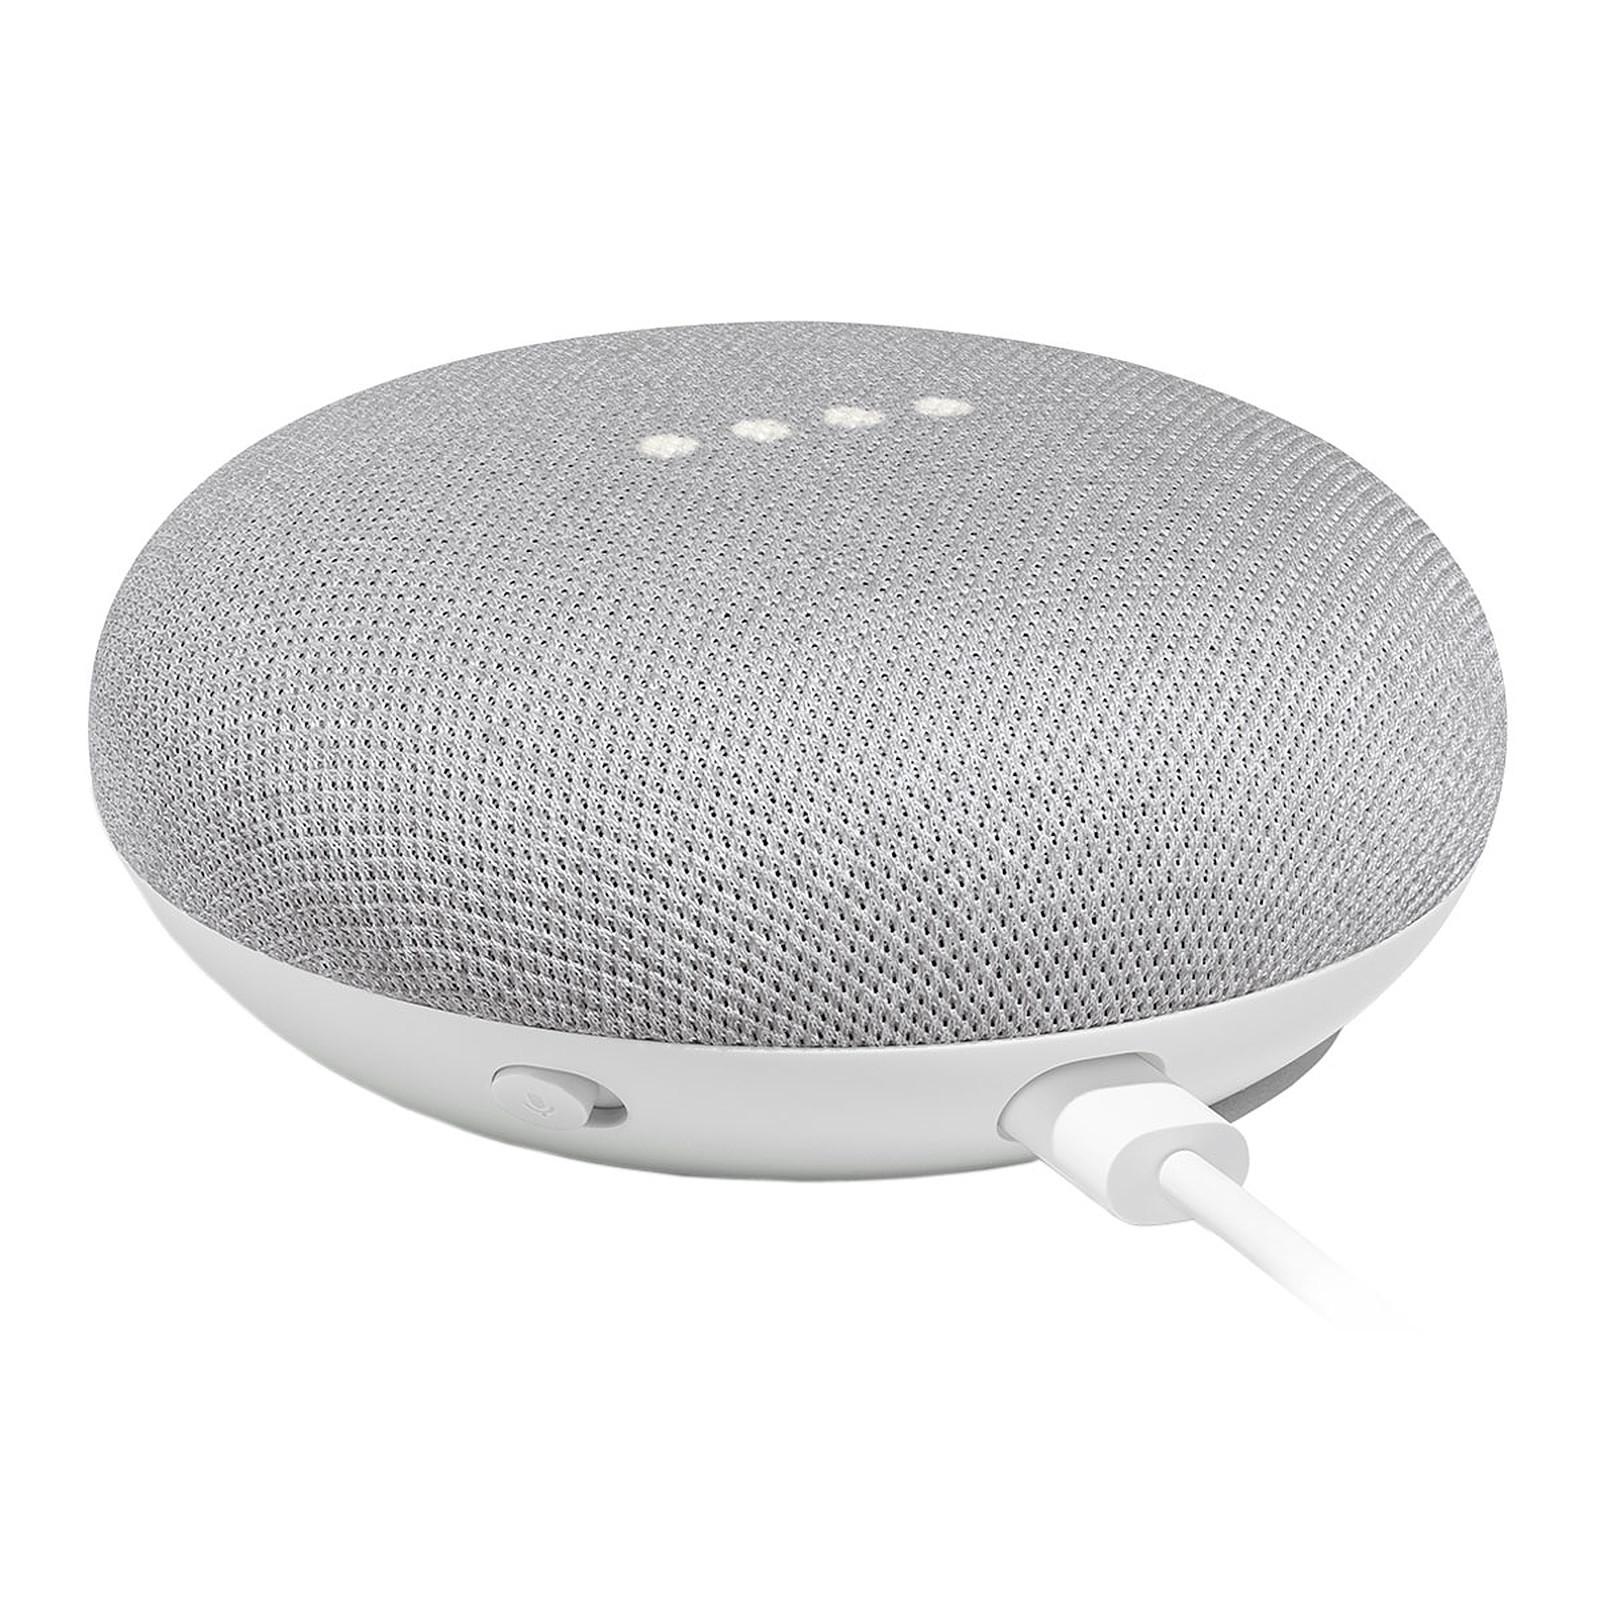 Assistant vocal Google Home Mini - Galet